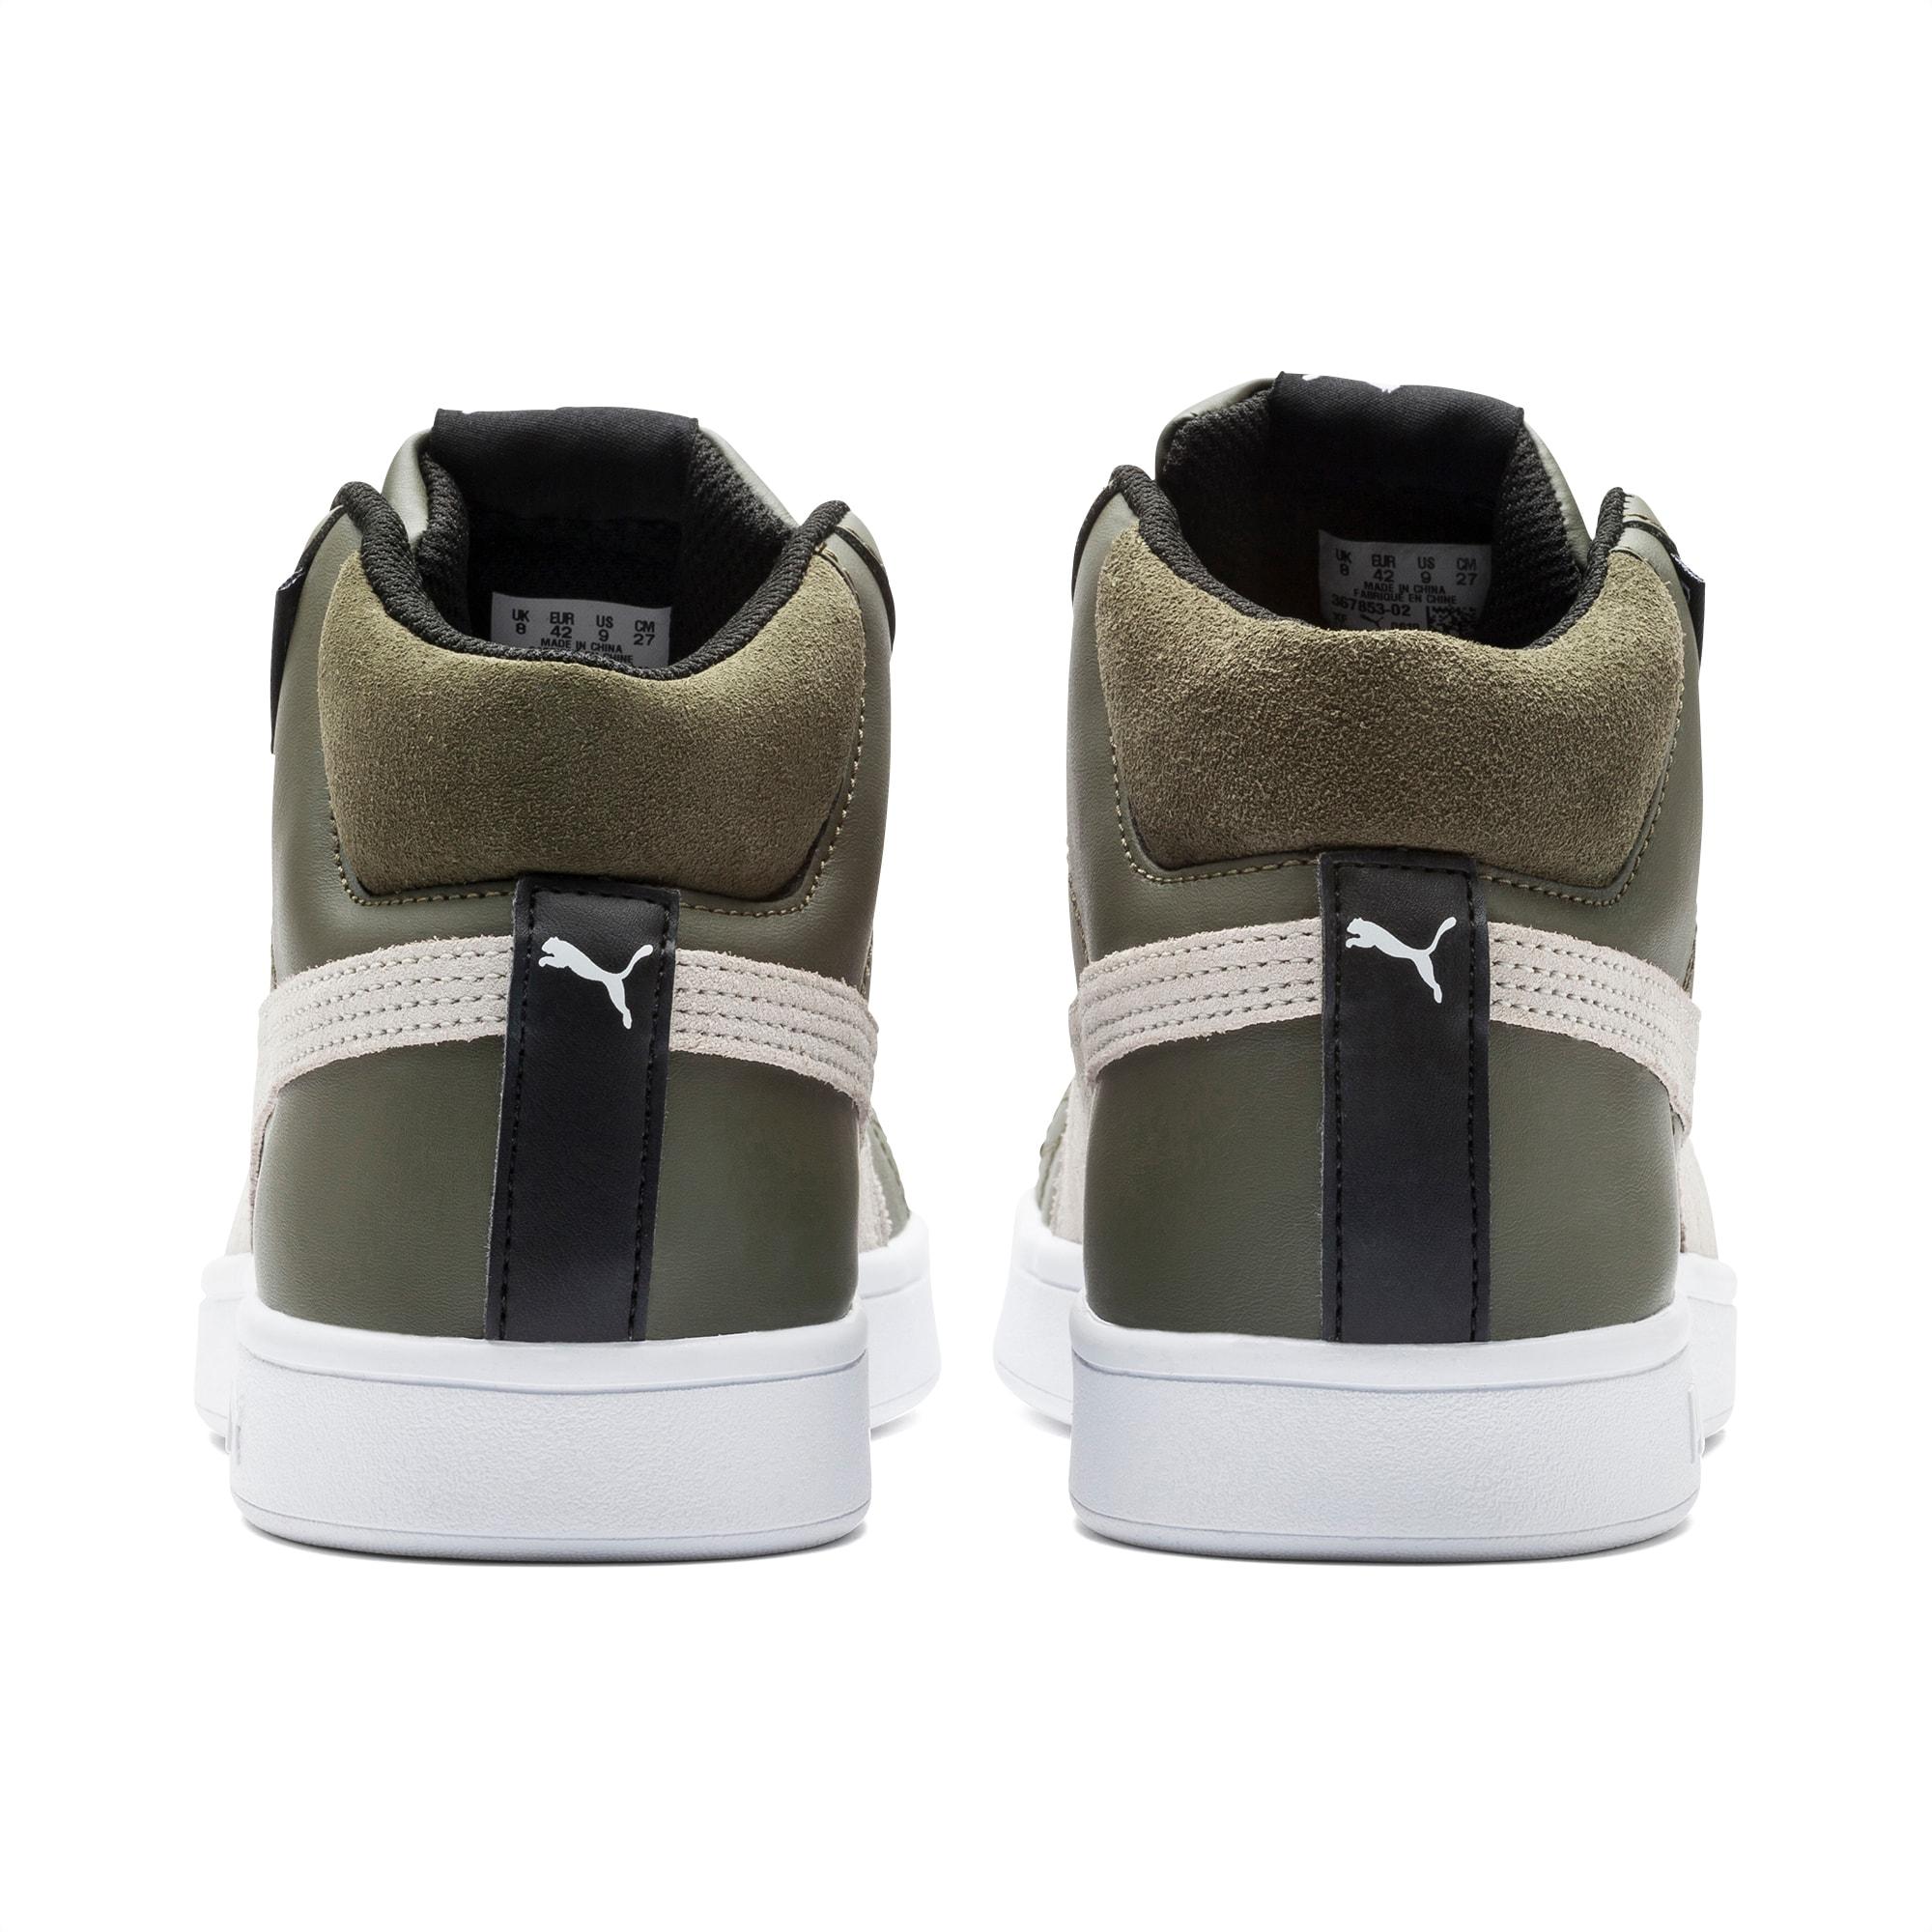 Chaussure montante Smash v2 Mid PureTEX